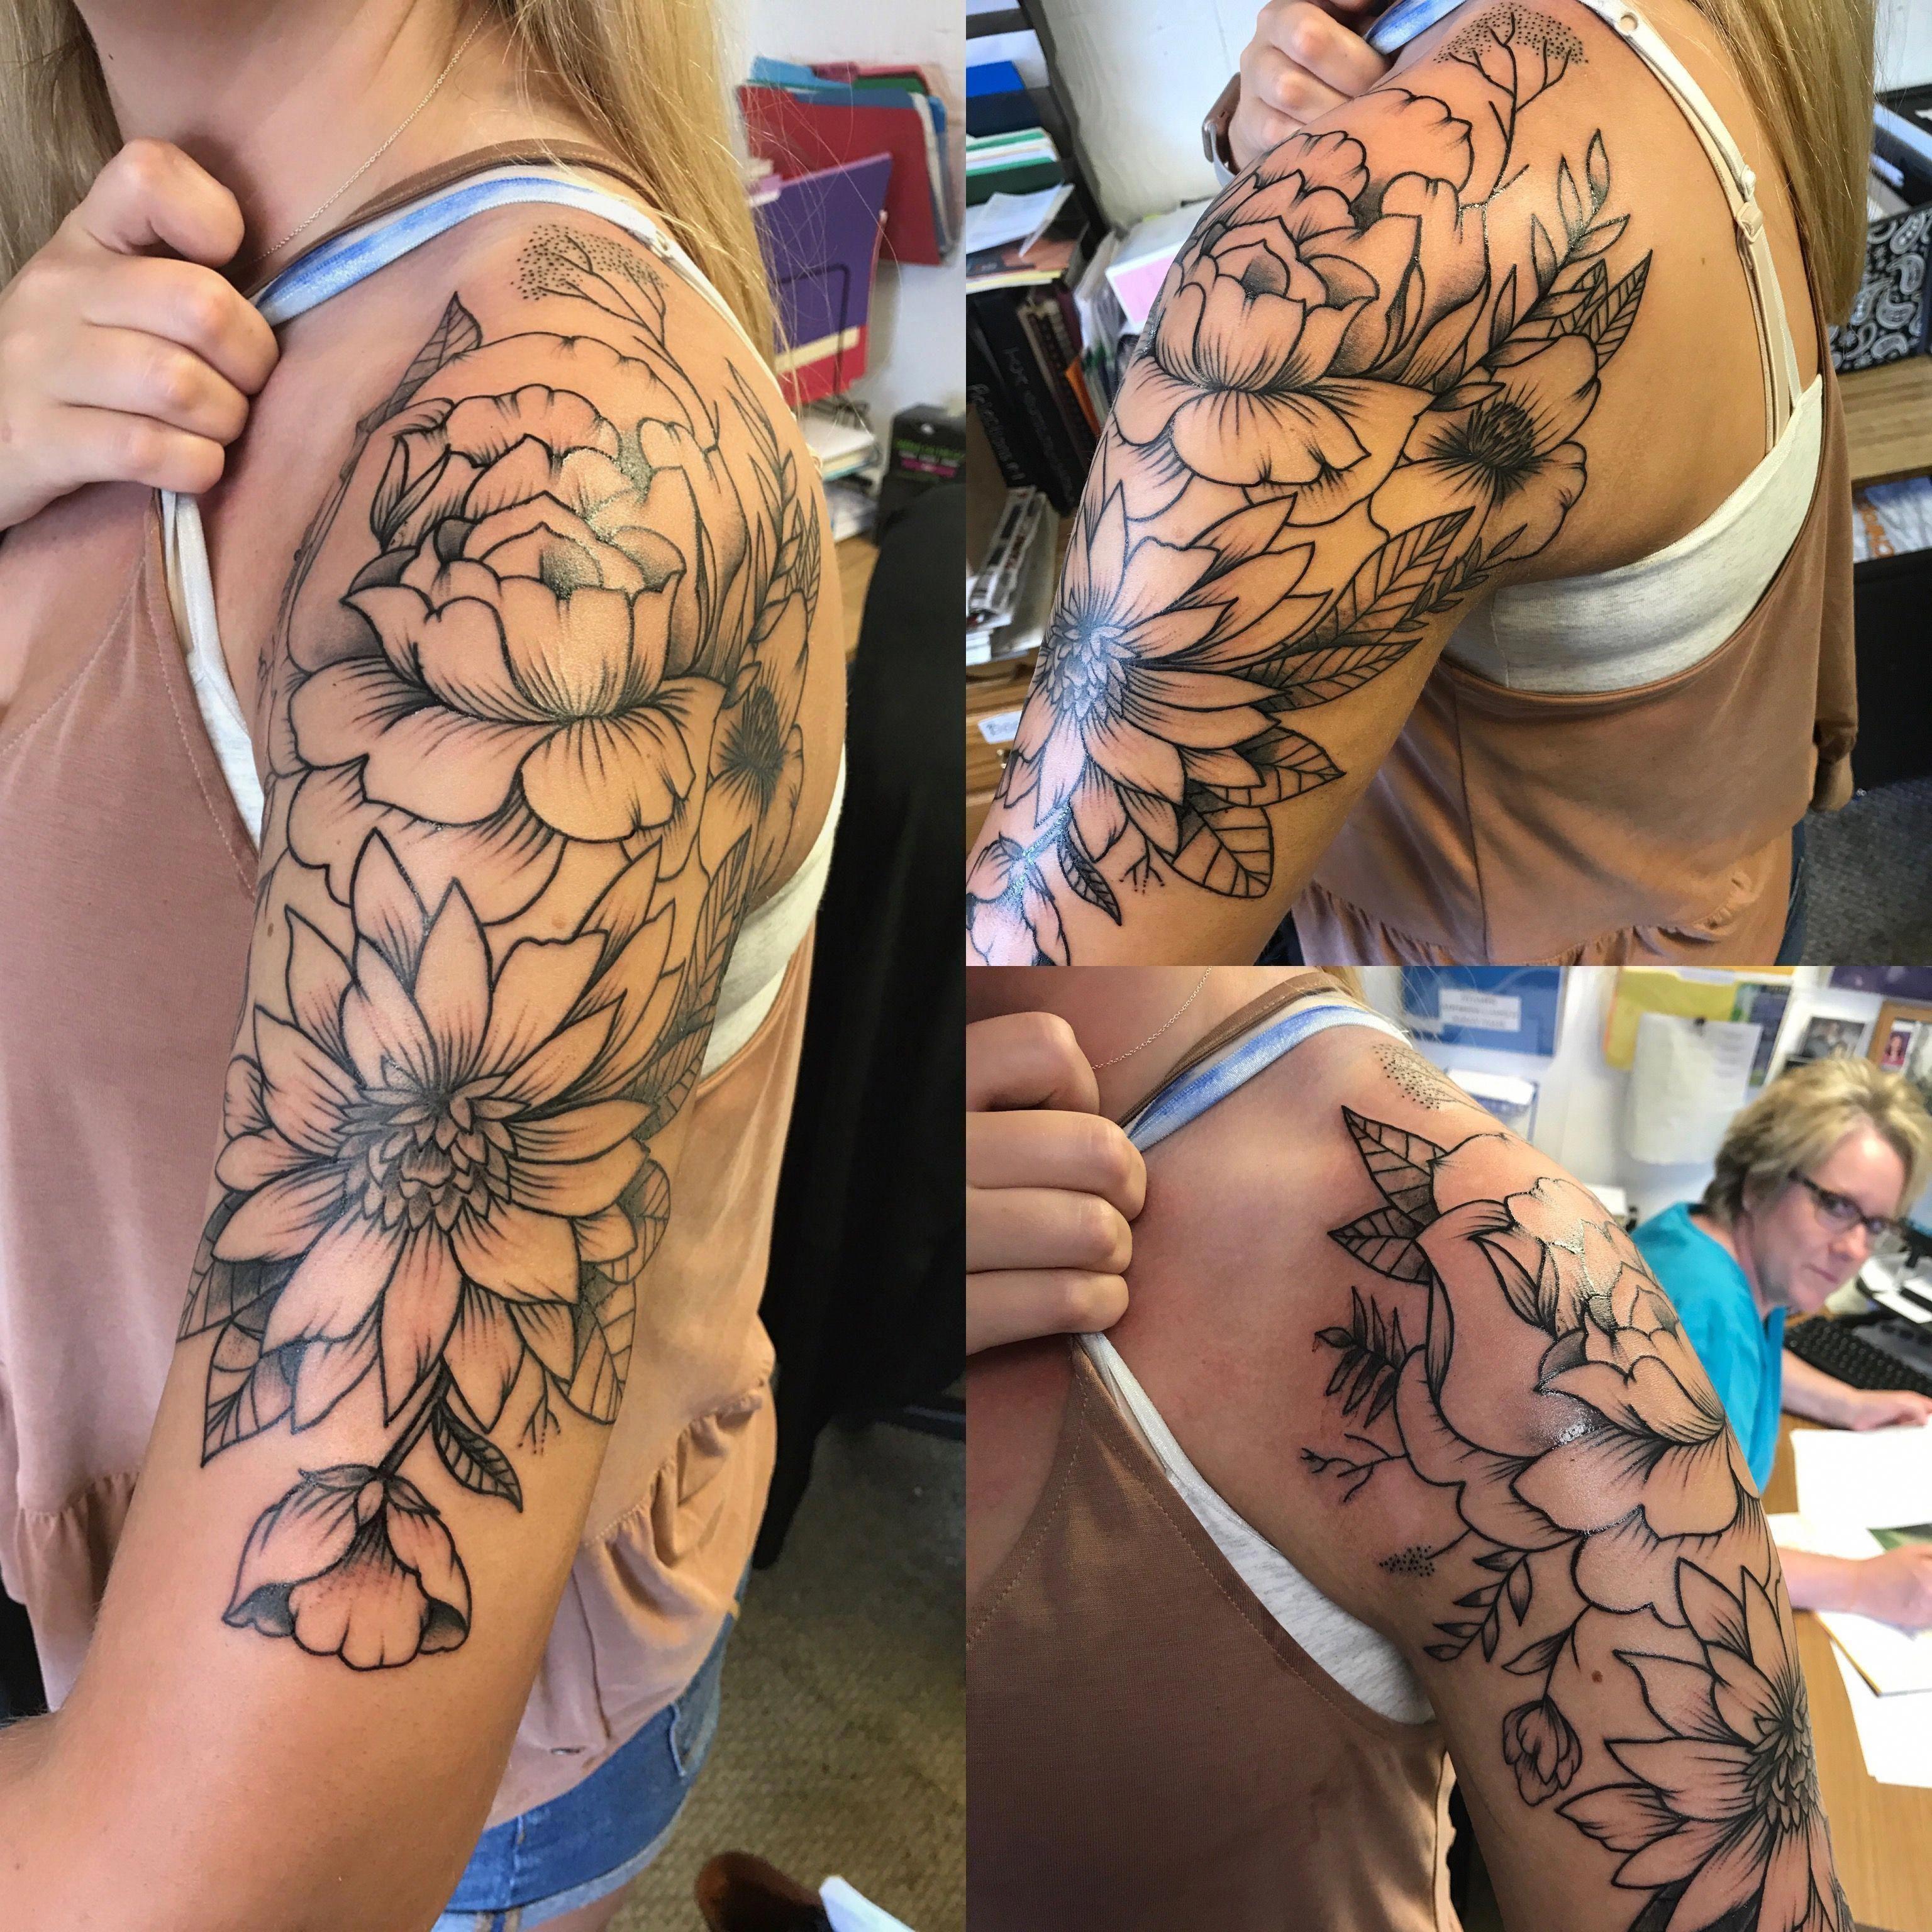 Floral Half Sleeve Tattoo Ideasfortattoosforwomen Indiainkdesigns Half Sleeve Tattoos Color Sleeve Tattoos For Women